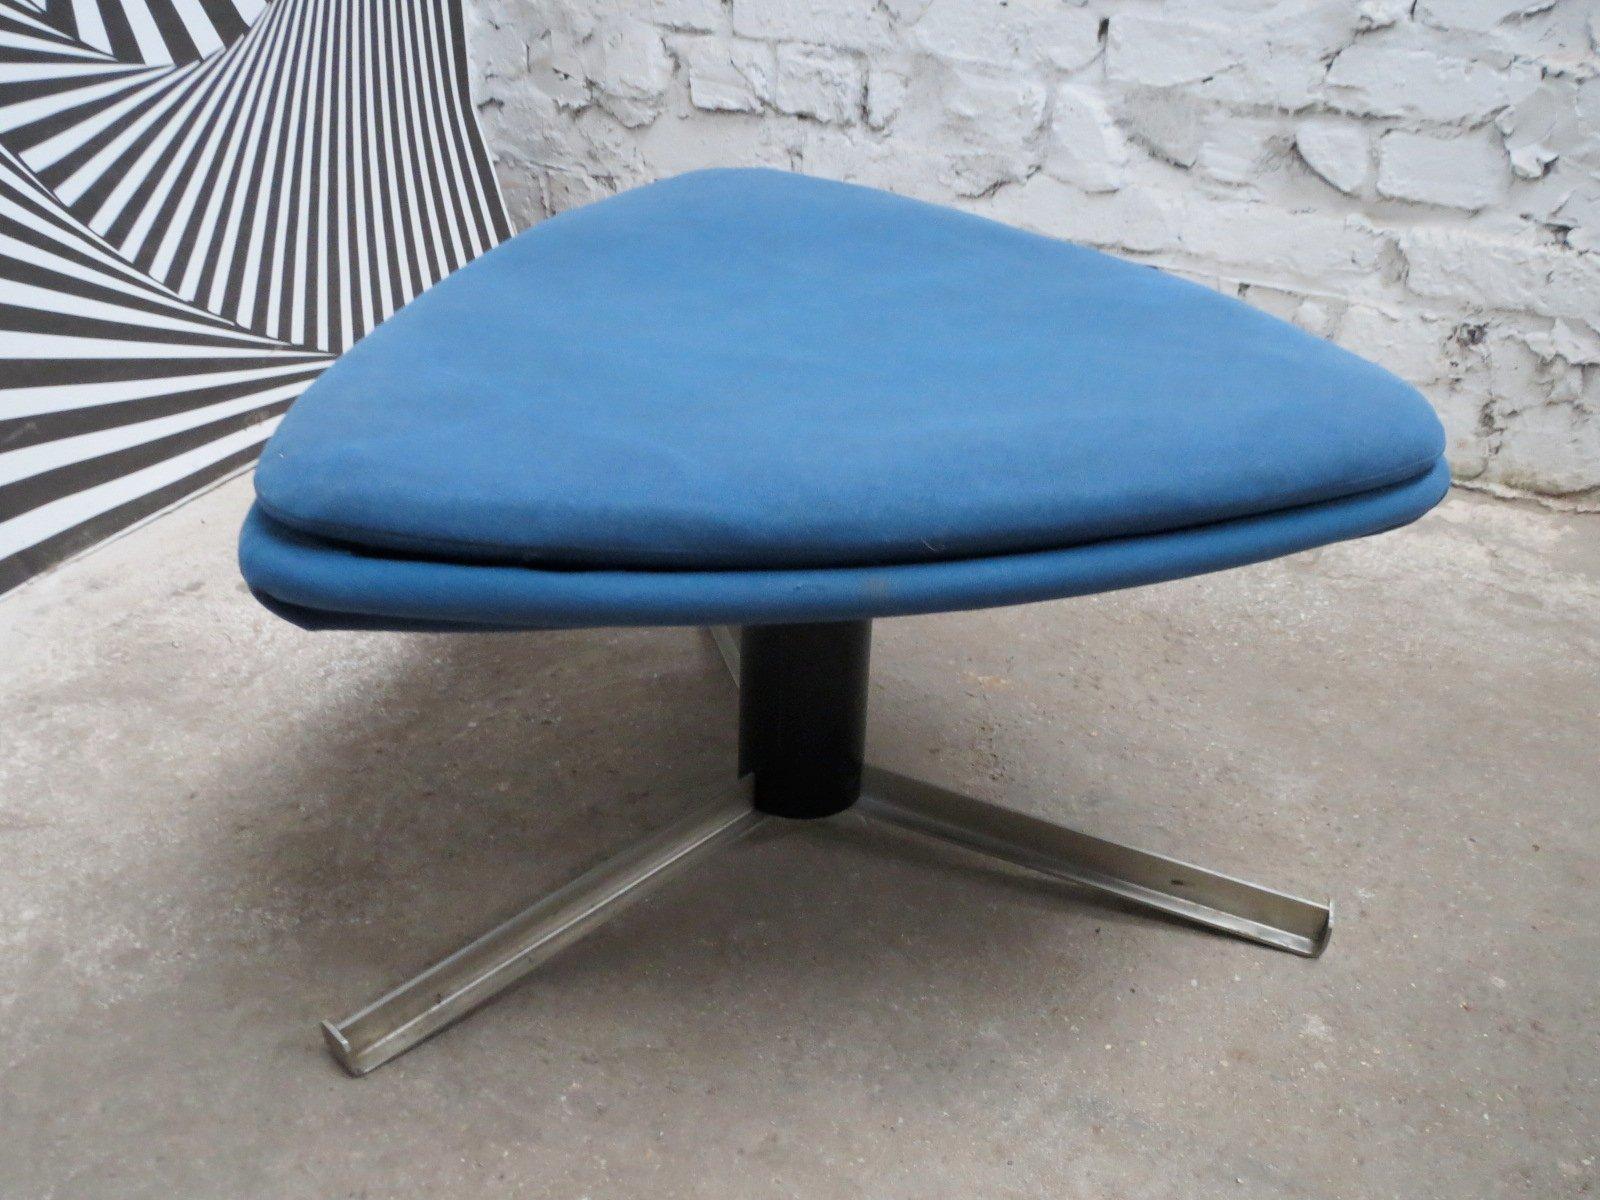 Space Age Furniture Vintage Space Age Freeform Triangular Tripod Ottoman From Steiner